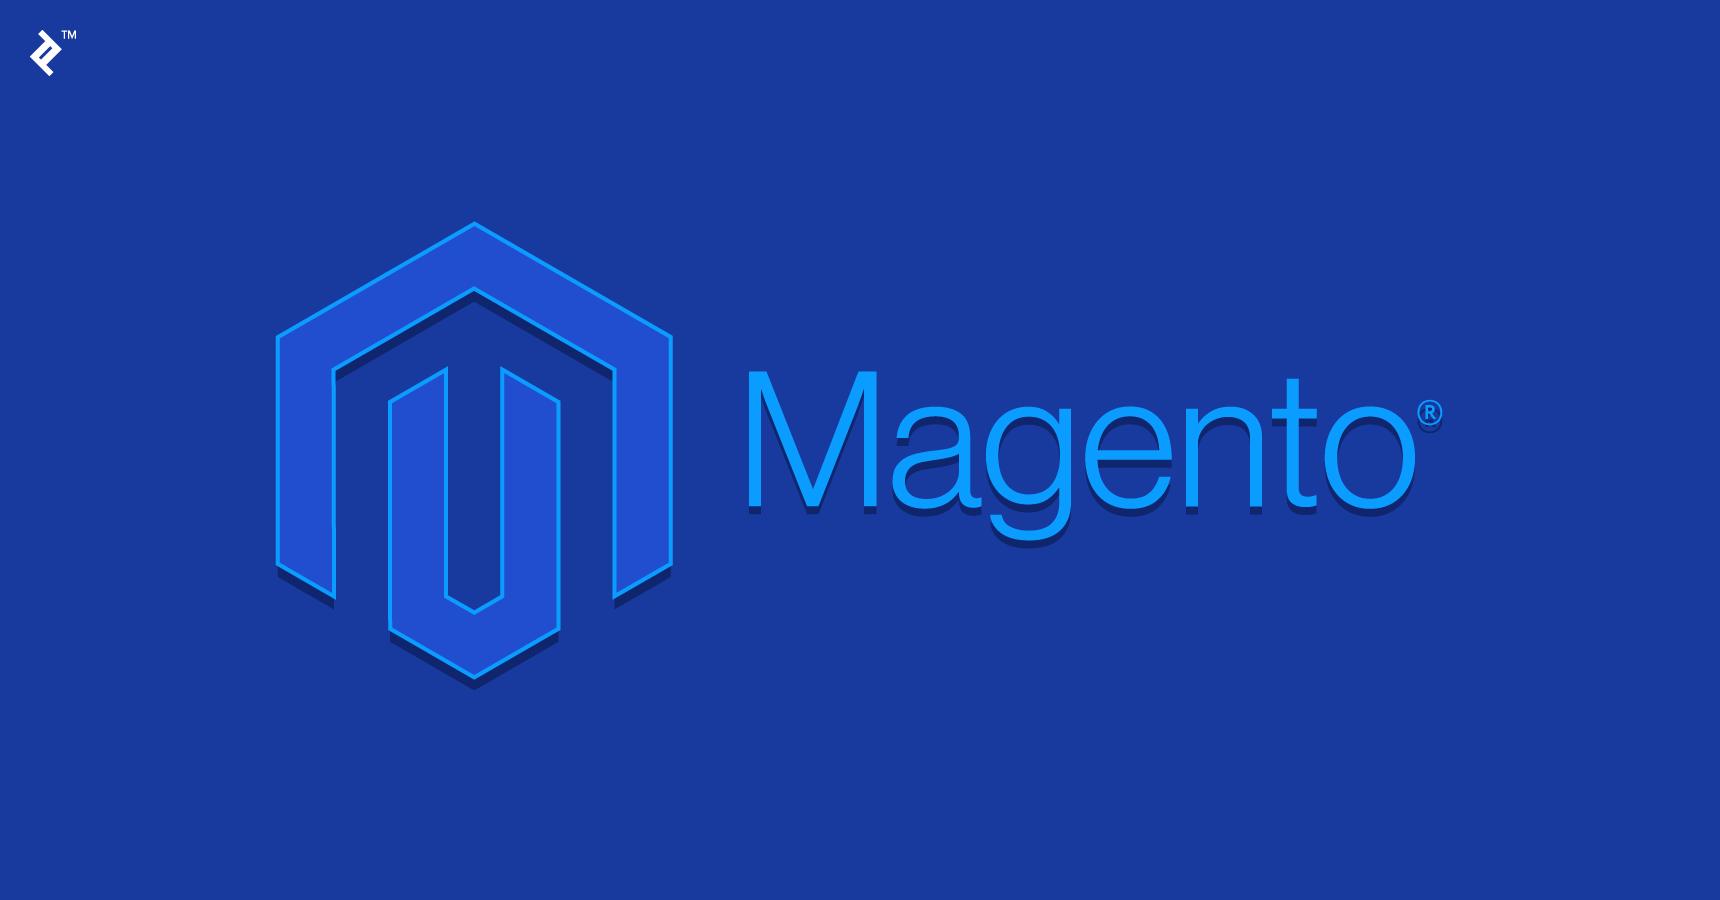 Magento Developer Job Description Template | Toptal®